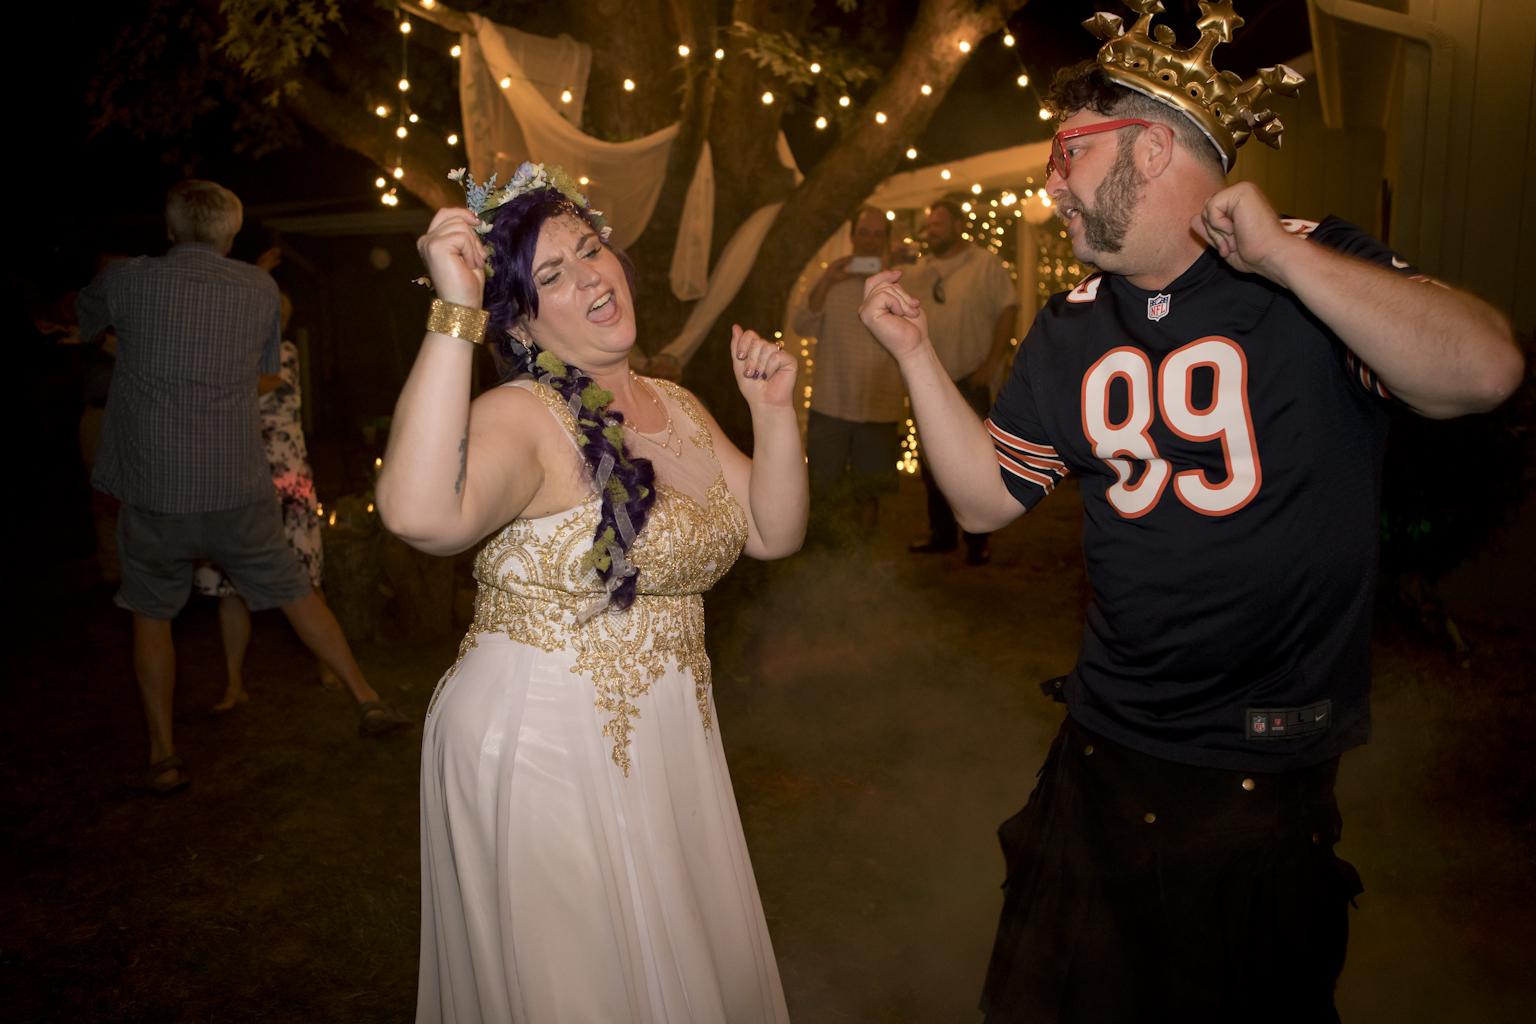 Tina and Adam wedding_Studio Misha Wedding Photography Asheville Photographer and Videographer00129.JPG